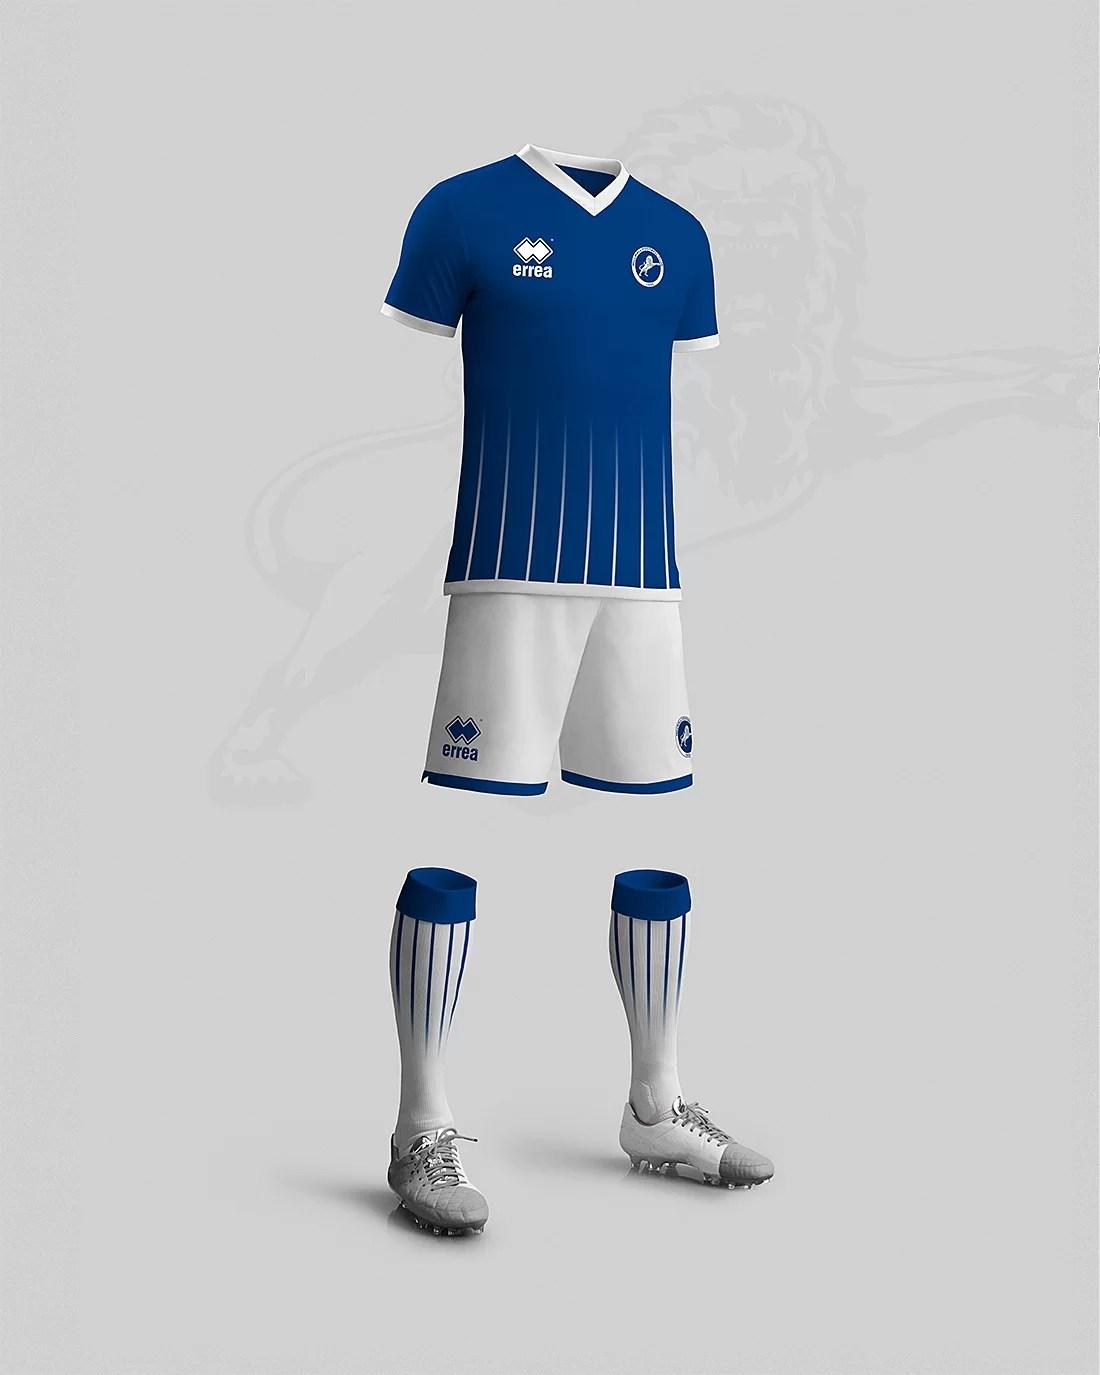 Stroje piłkarskie Millwall home kit design